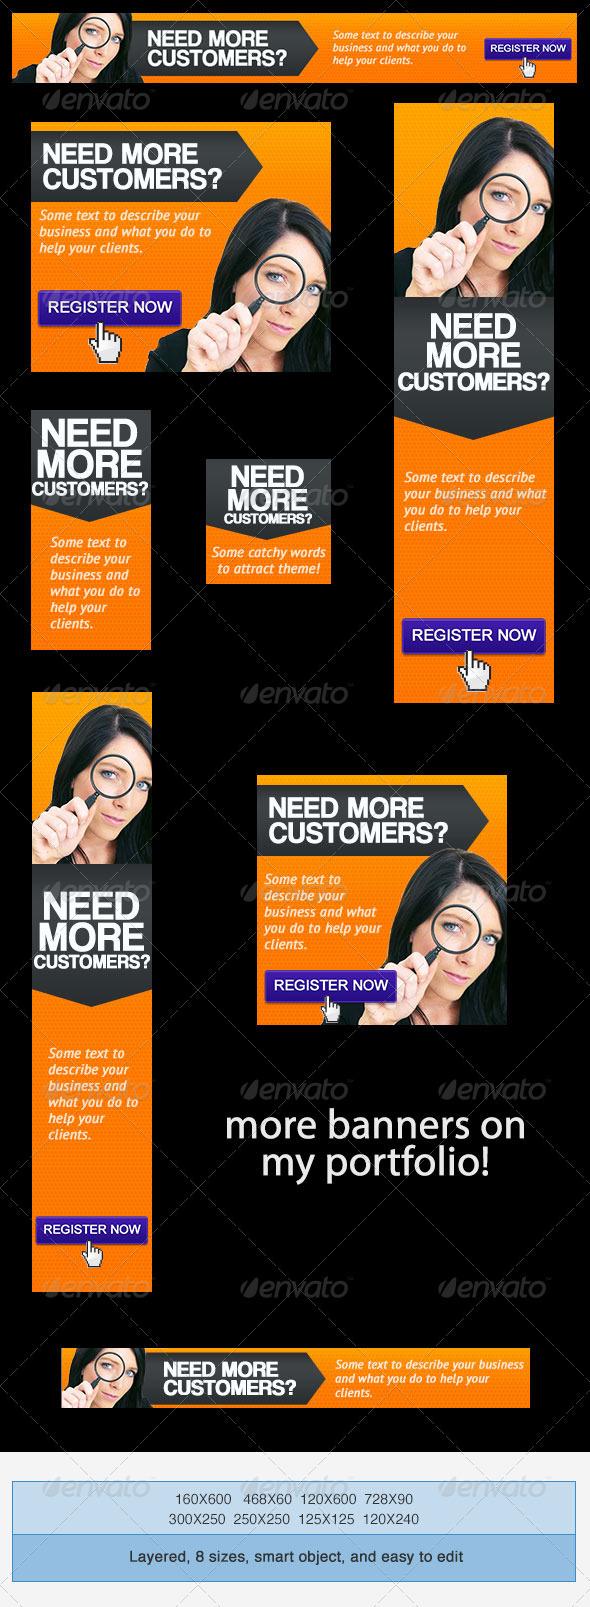 GraphicRiver Lead Conversion Banner Ad PSD Template 4034575